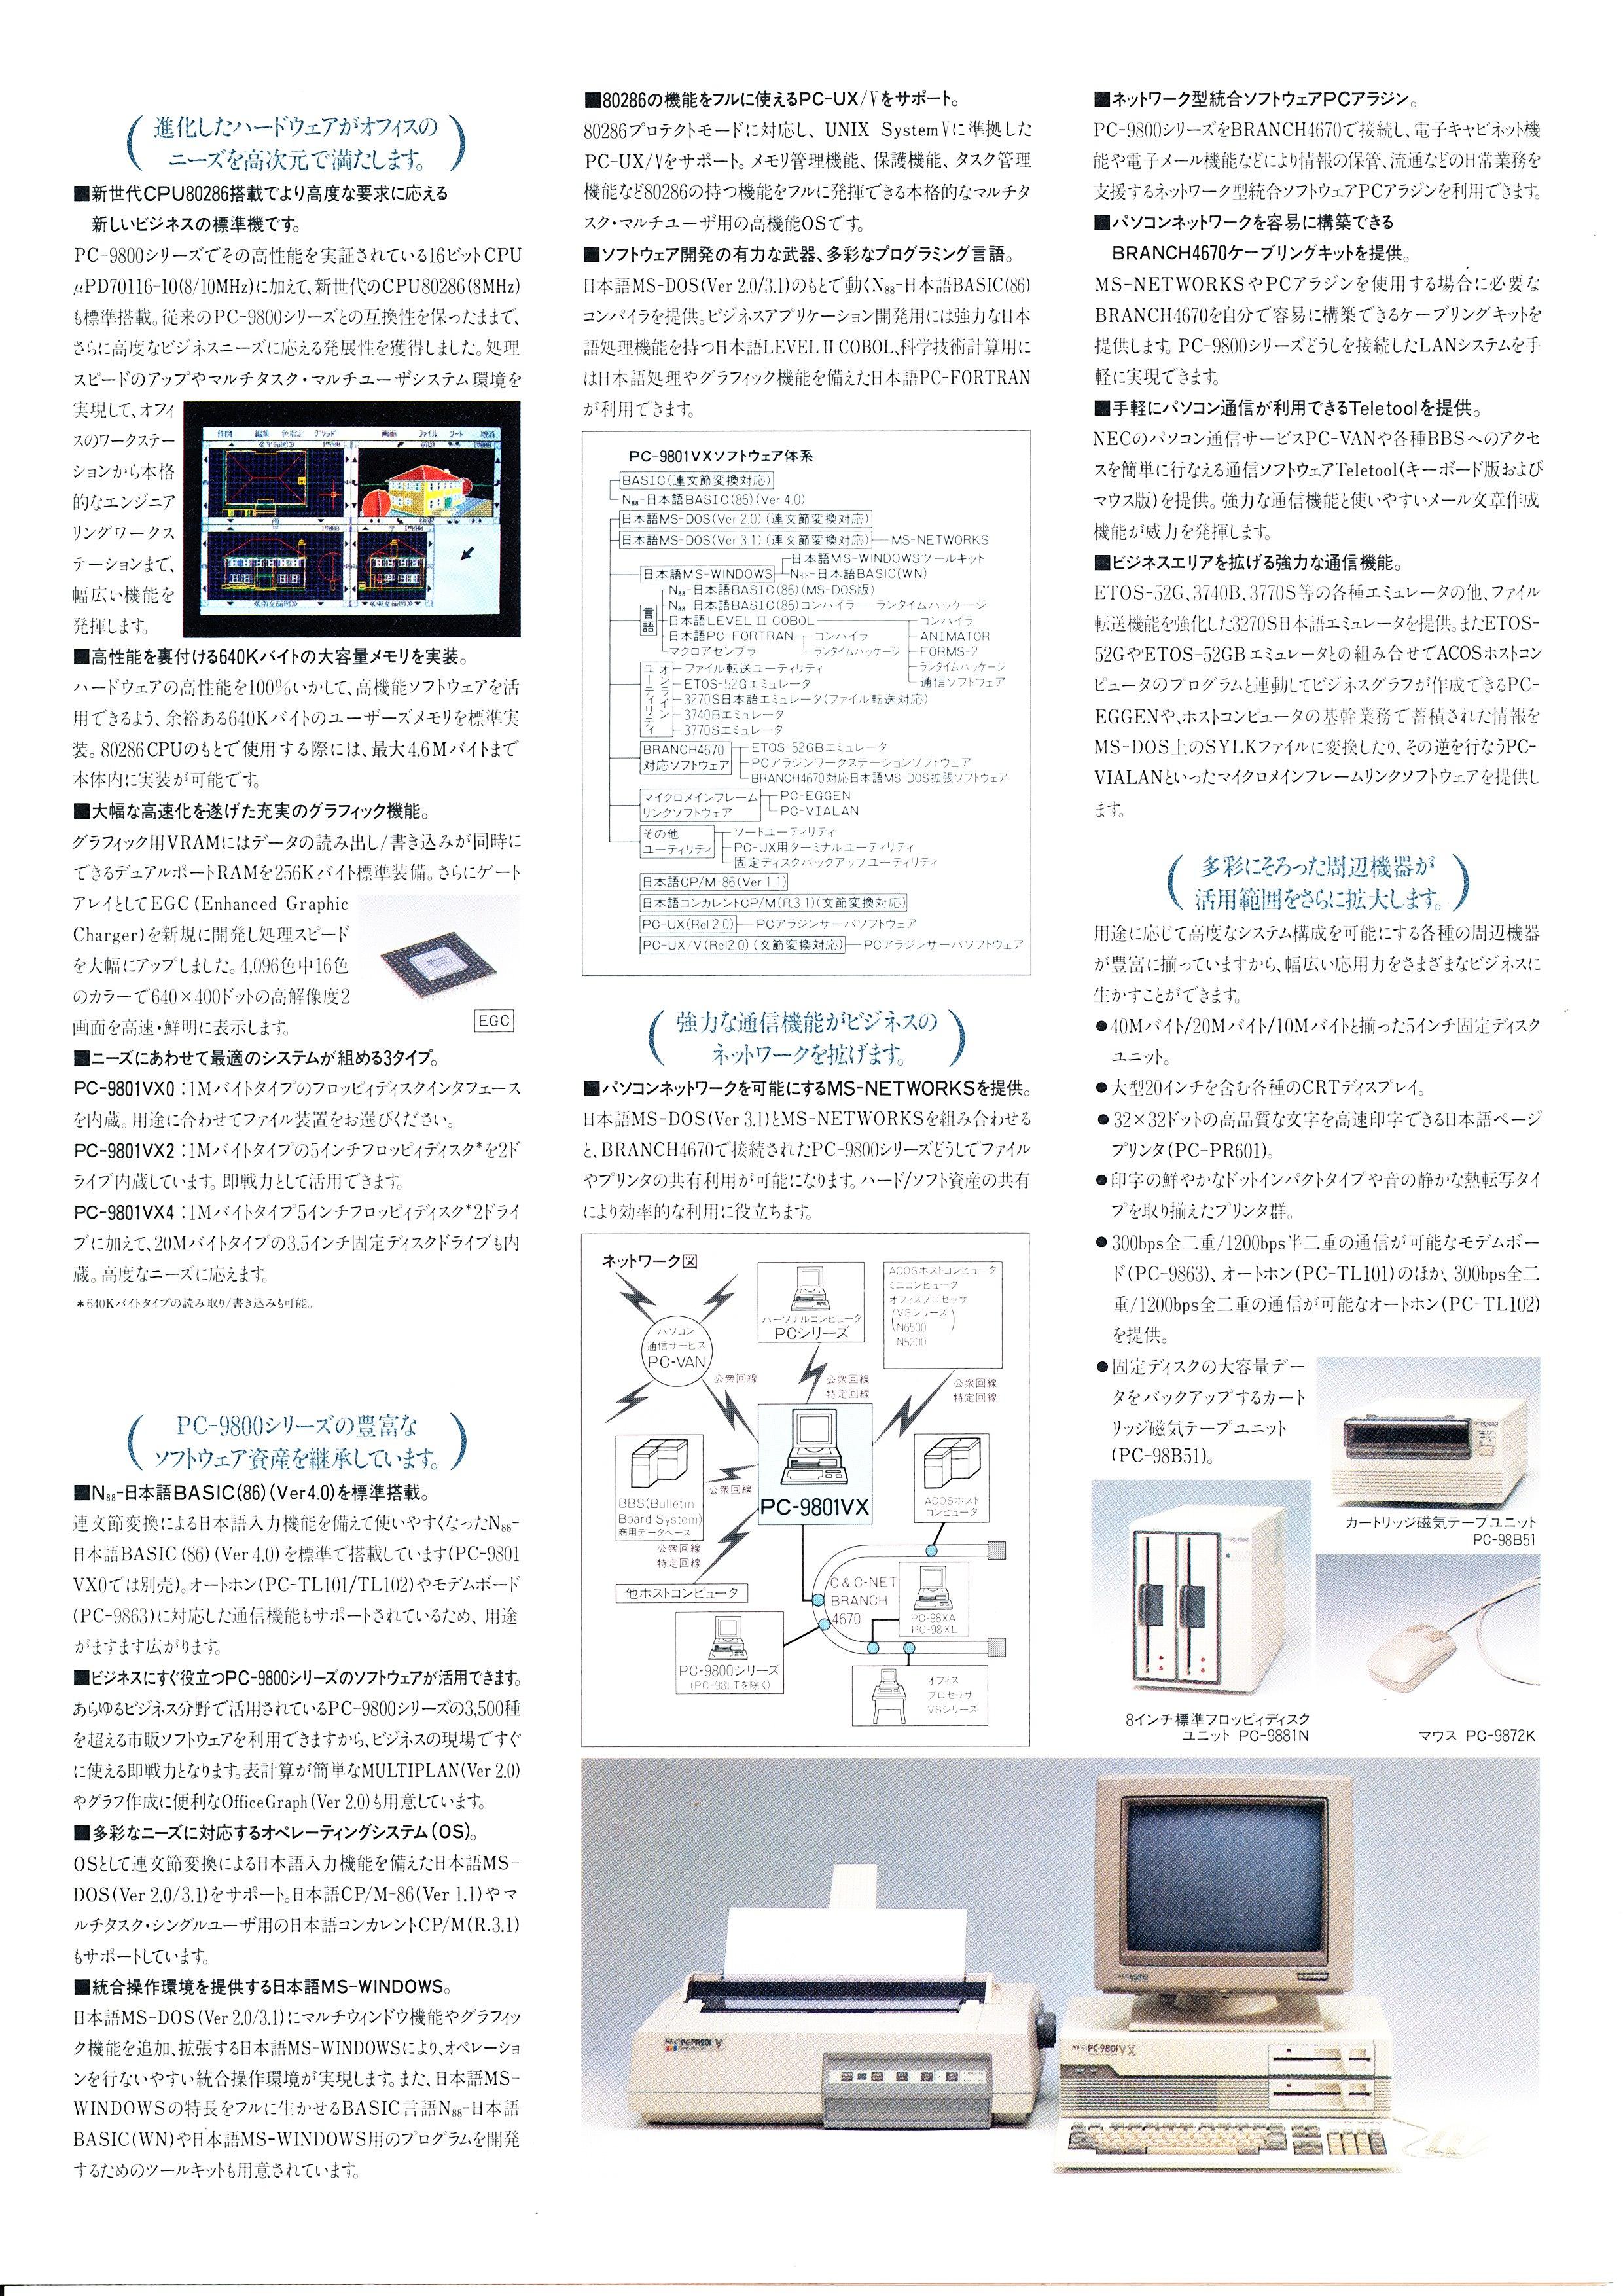 PC-9801VX P3